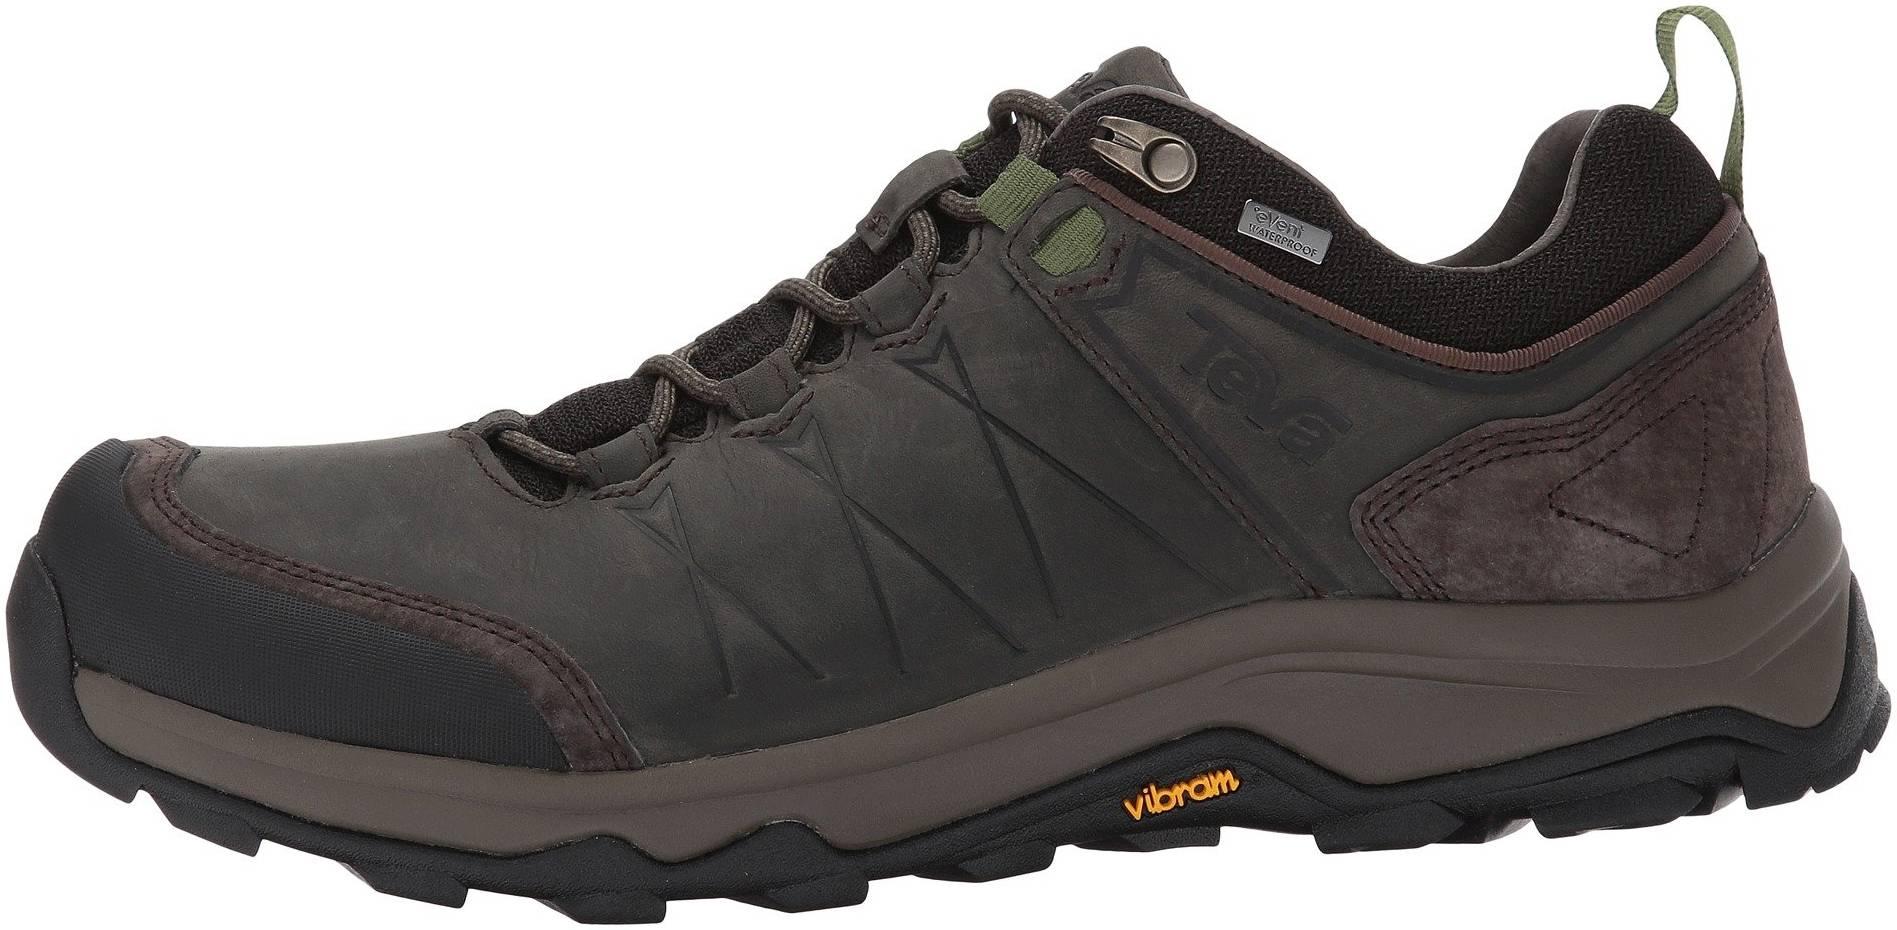 Save 33% on Teva Hiking Shoes (5 Models